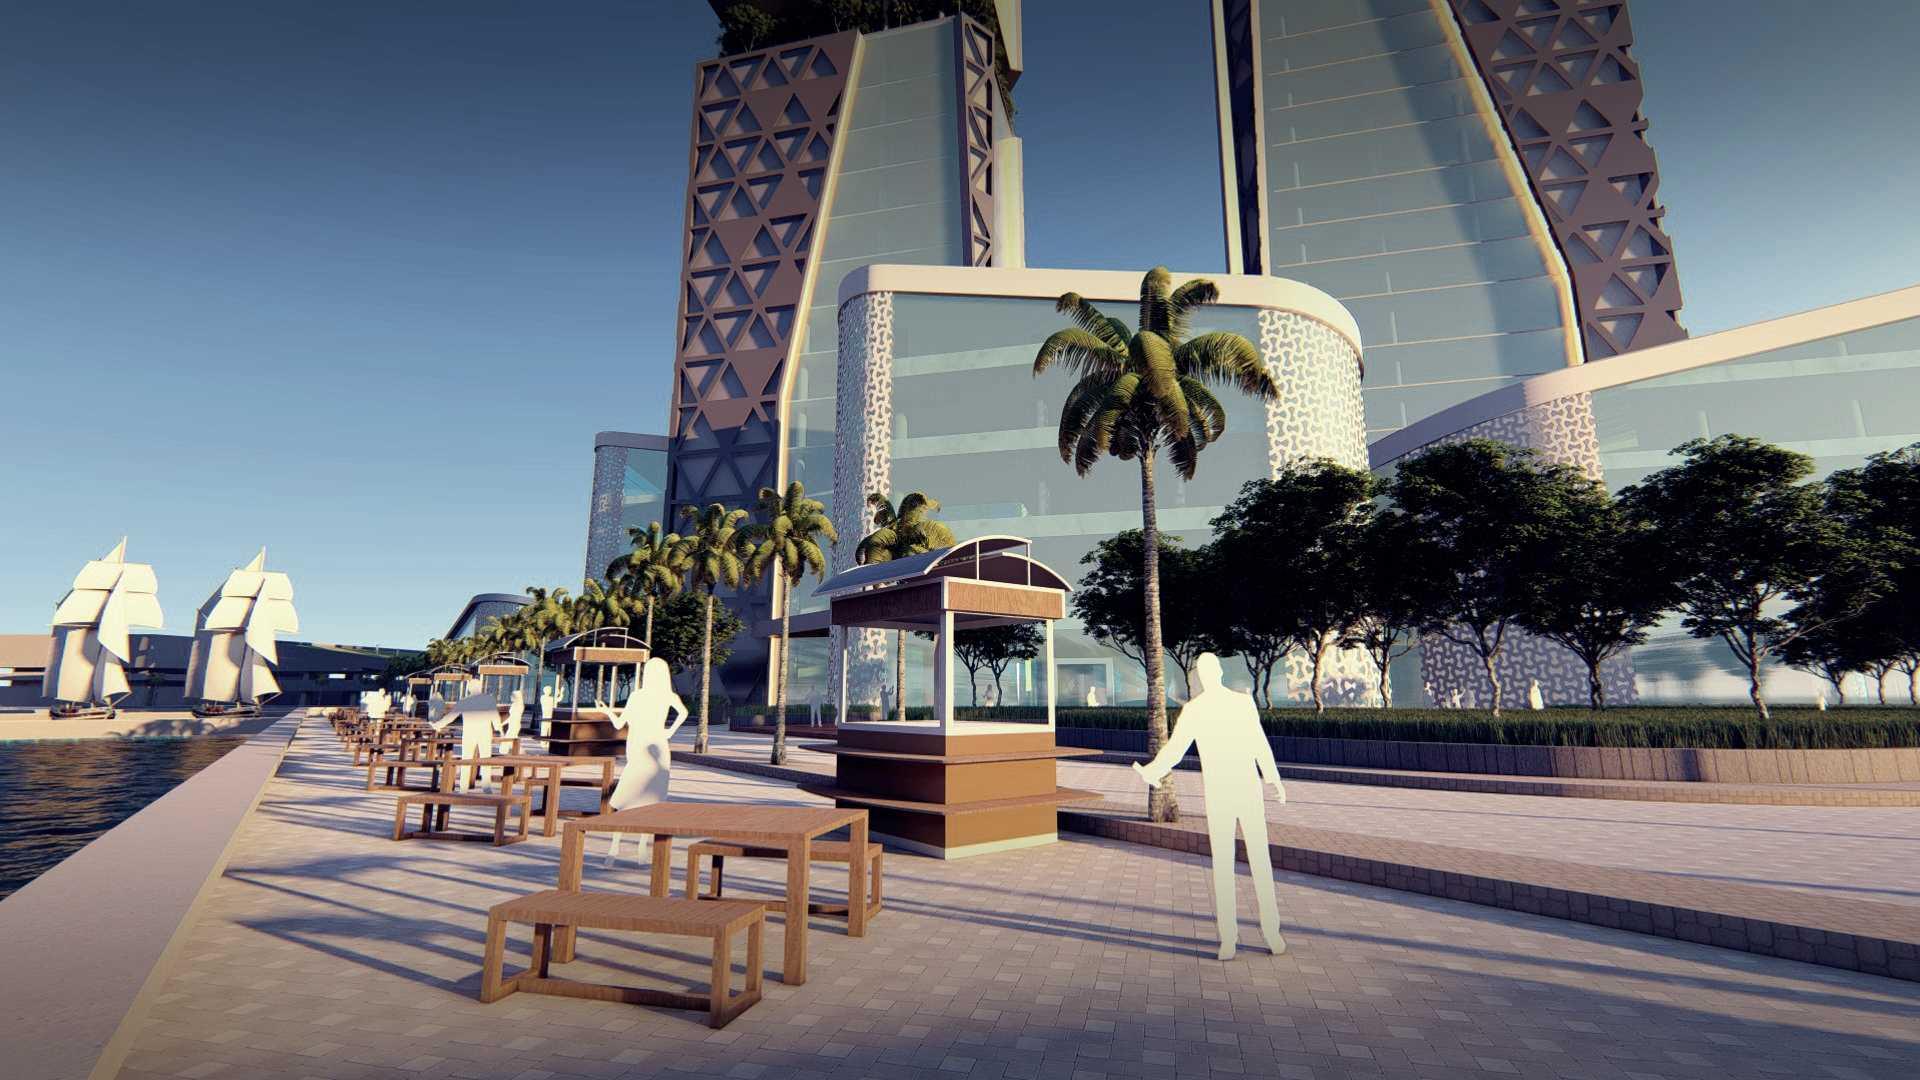 Miv Architects (Ar. Muhammad Ikhsan Hamiru, Iai & Partners) 1St Winner Of New Balaikota Makassar City & Dprd Office Design Competition Kota Makassar, Sulawesi Selatan, Indonesia Kota Makassar, Sulawesi Selatan, Indonesia Exterior View Modern  48015